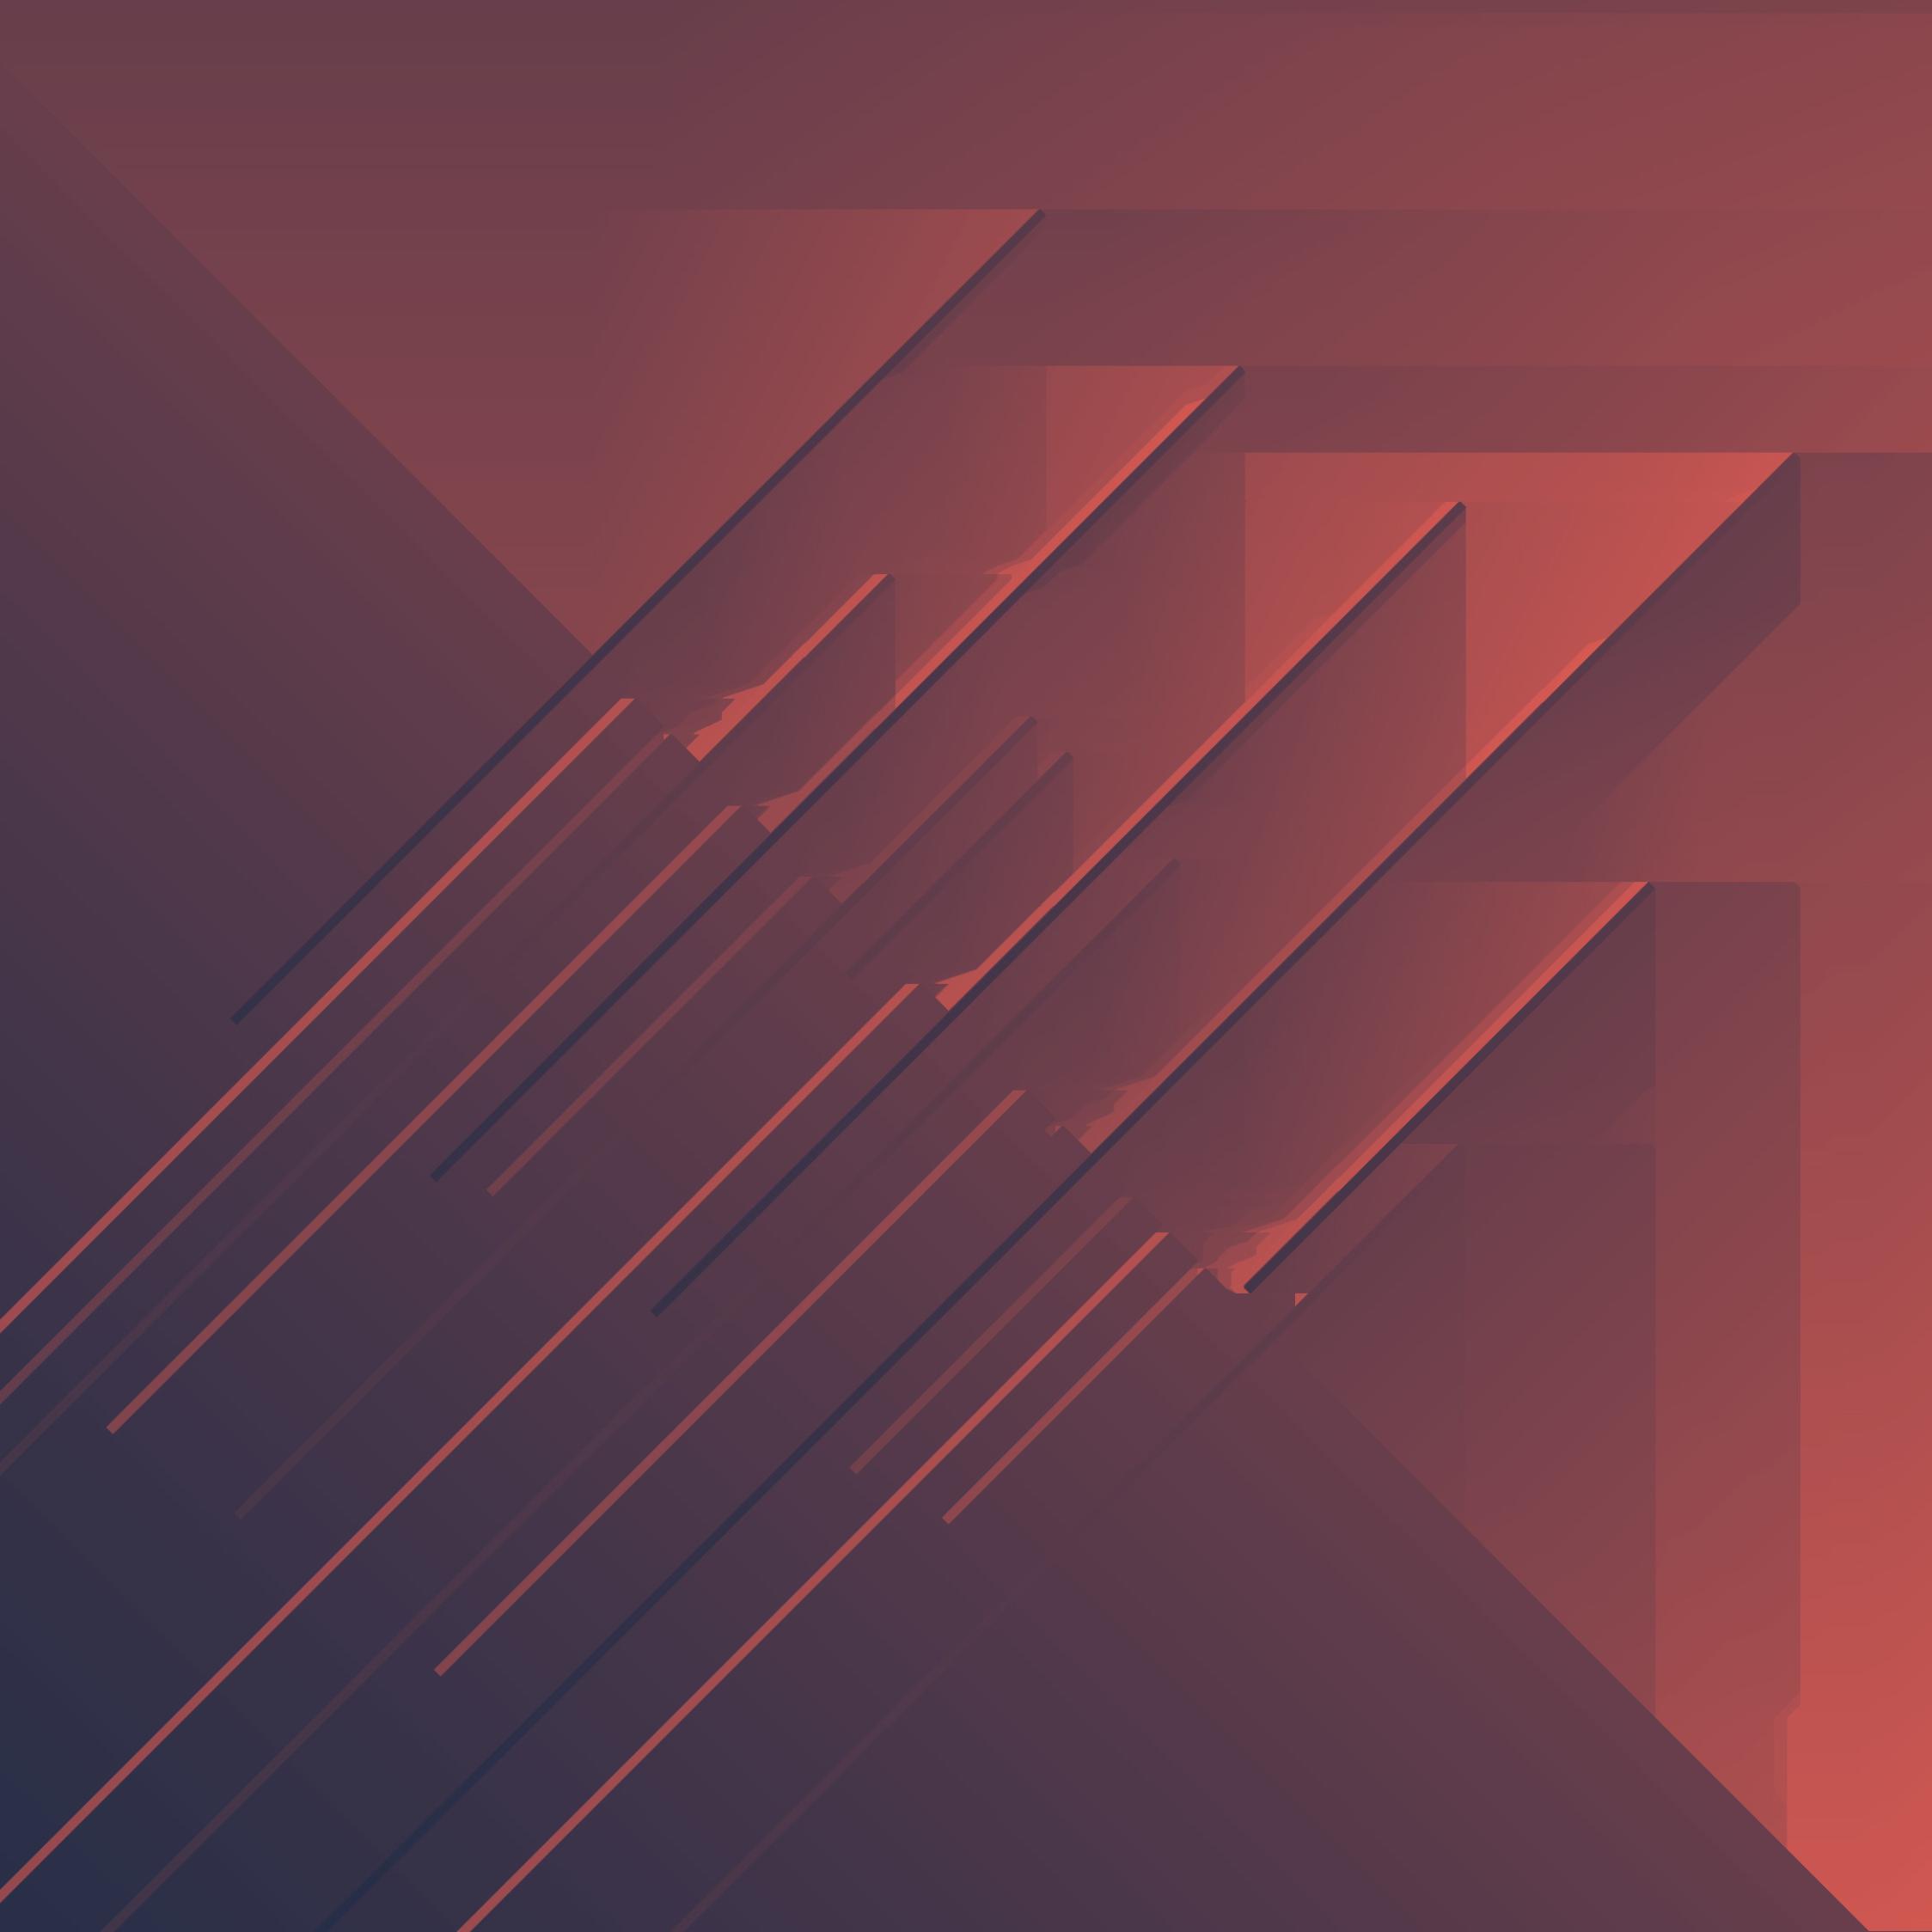 Abstract Minimalism, HD 4K Wallpaper